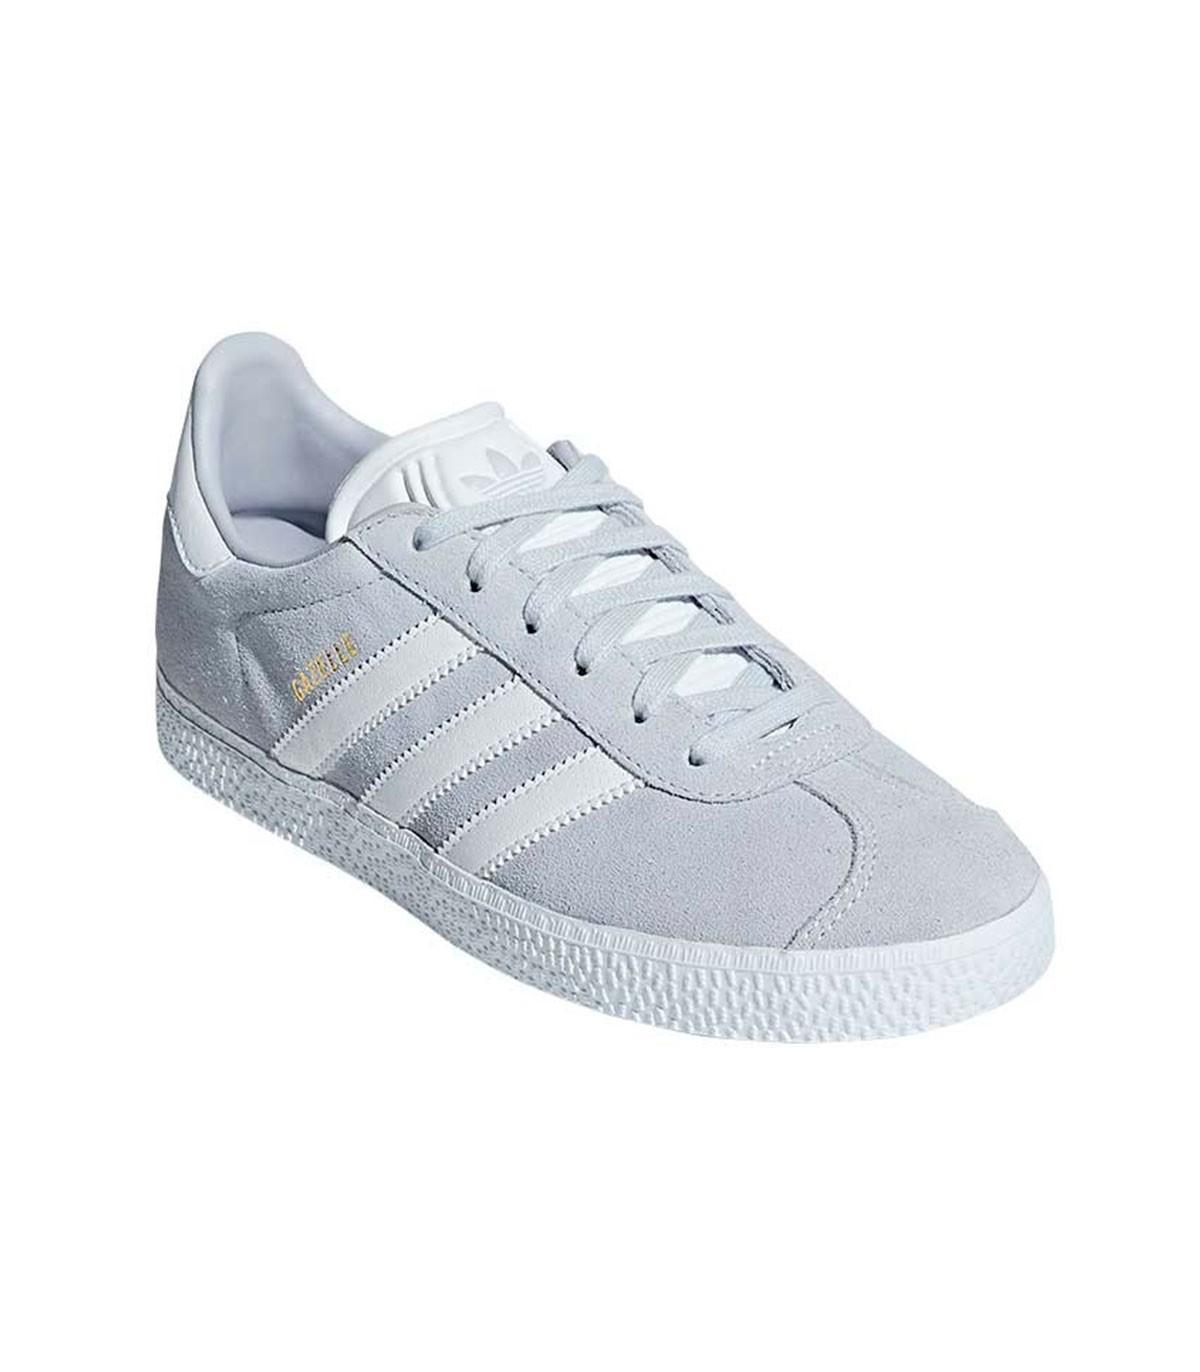 86d15d93fde Buy Zapatilla Adidas Gazelle J